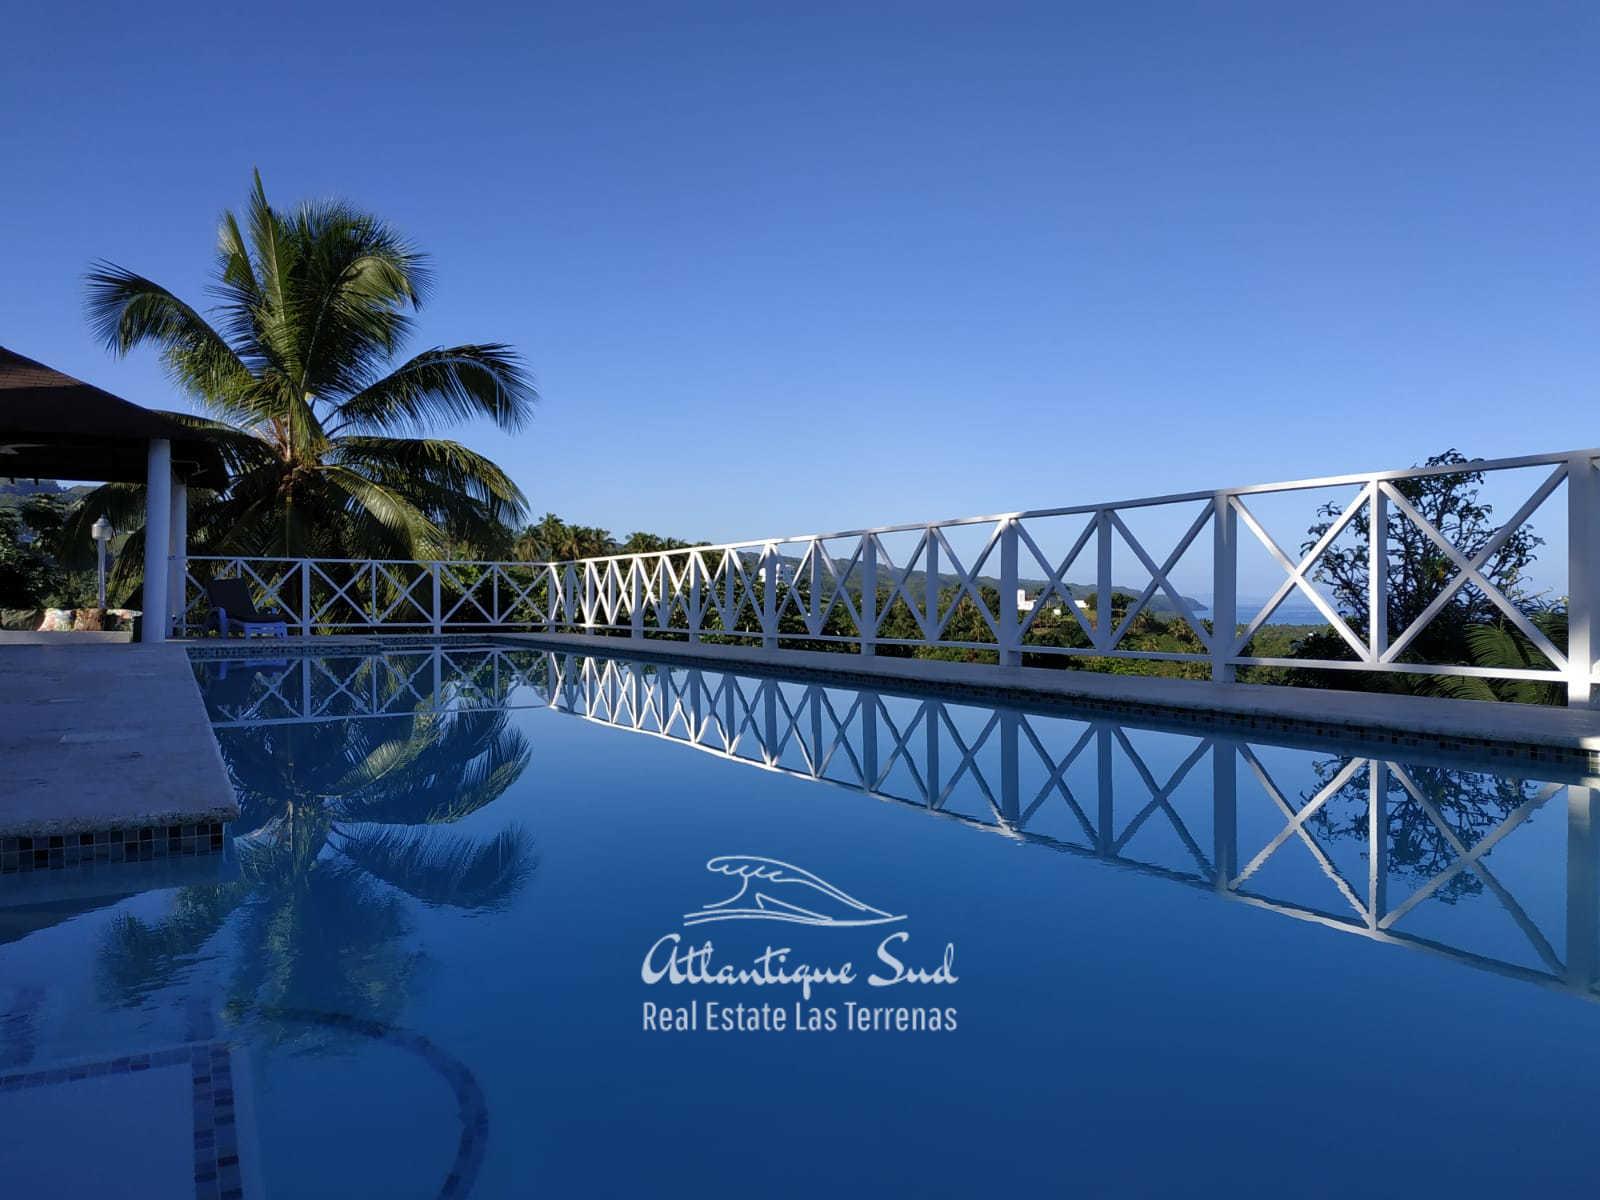 Villa for sale on hill in Las Terrenas Dominican republic27.jpg